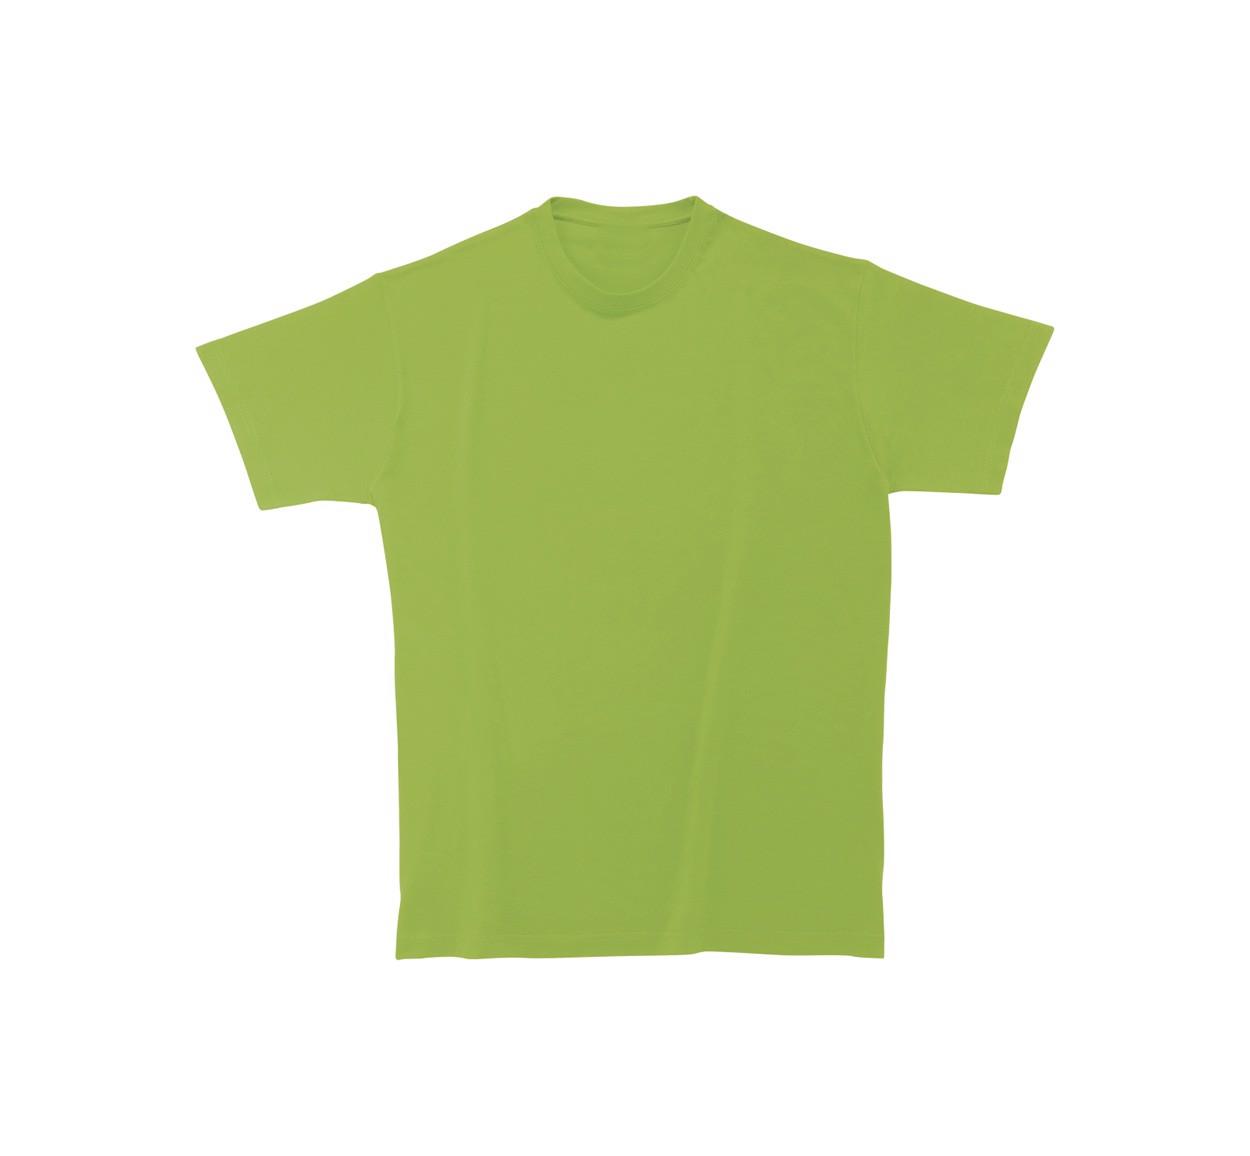 Youth T-Shirt HC Junior - Kiwi Green / L